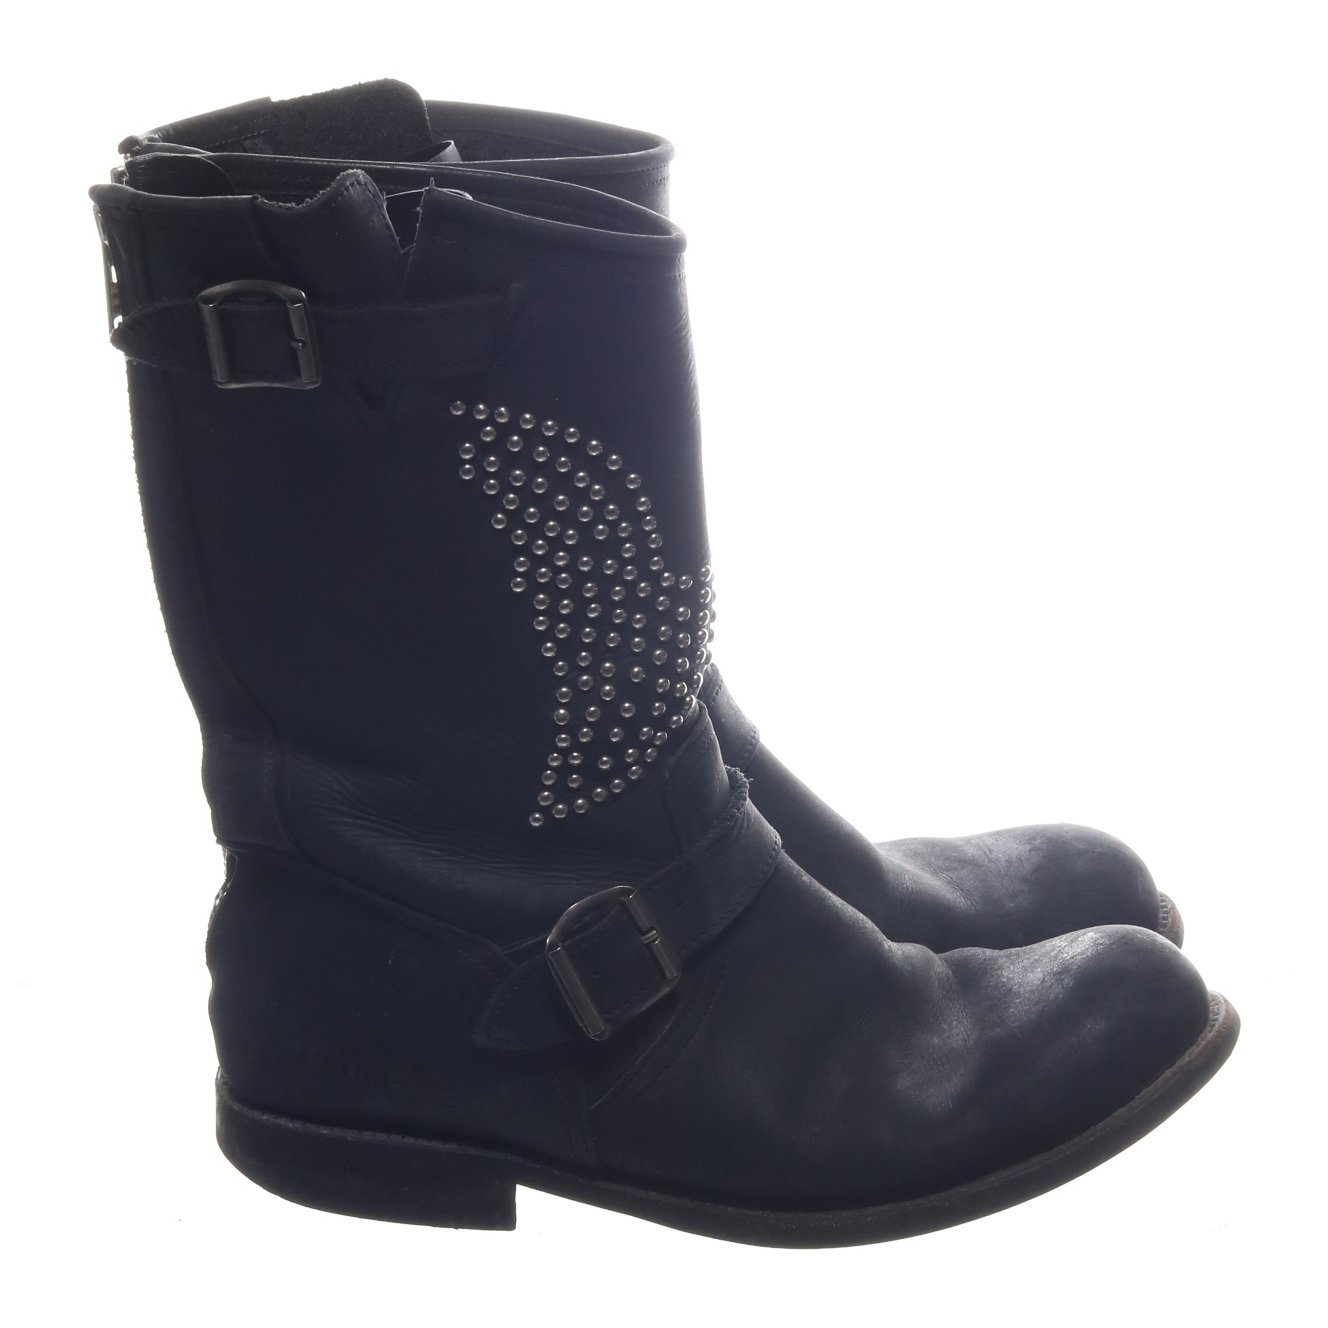 Primeboots, Boots, Svart, Skinn